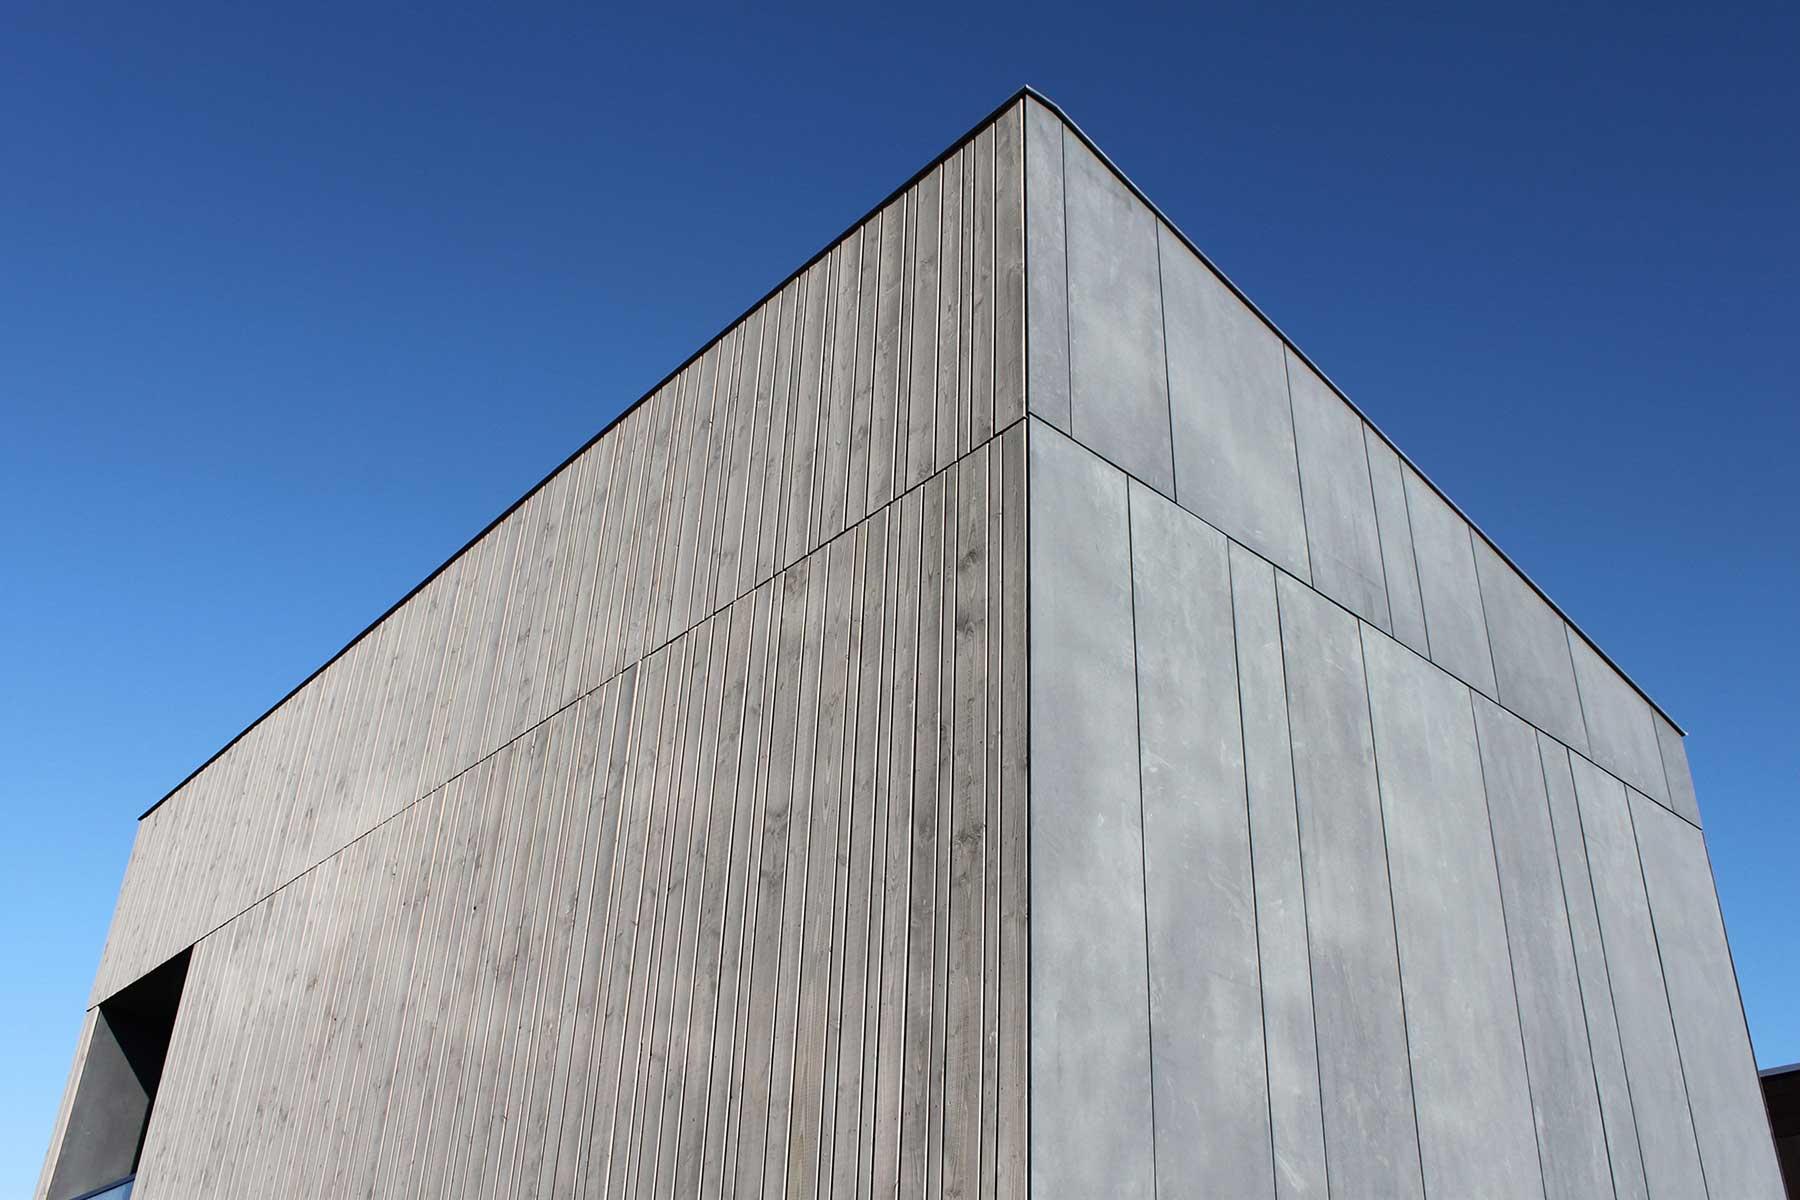 8A-Architecten-datcha-house-2-Lent-04